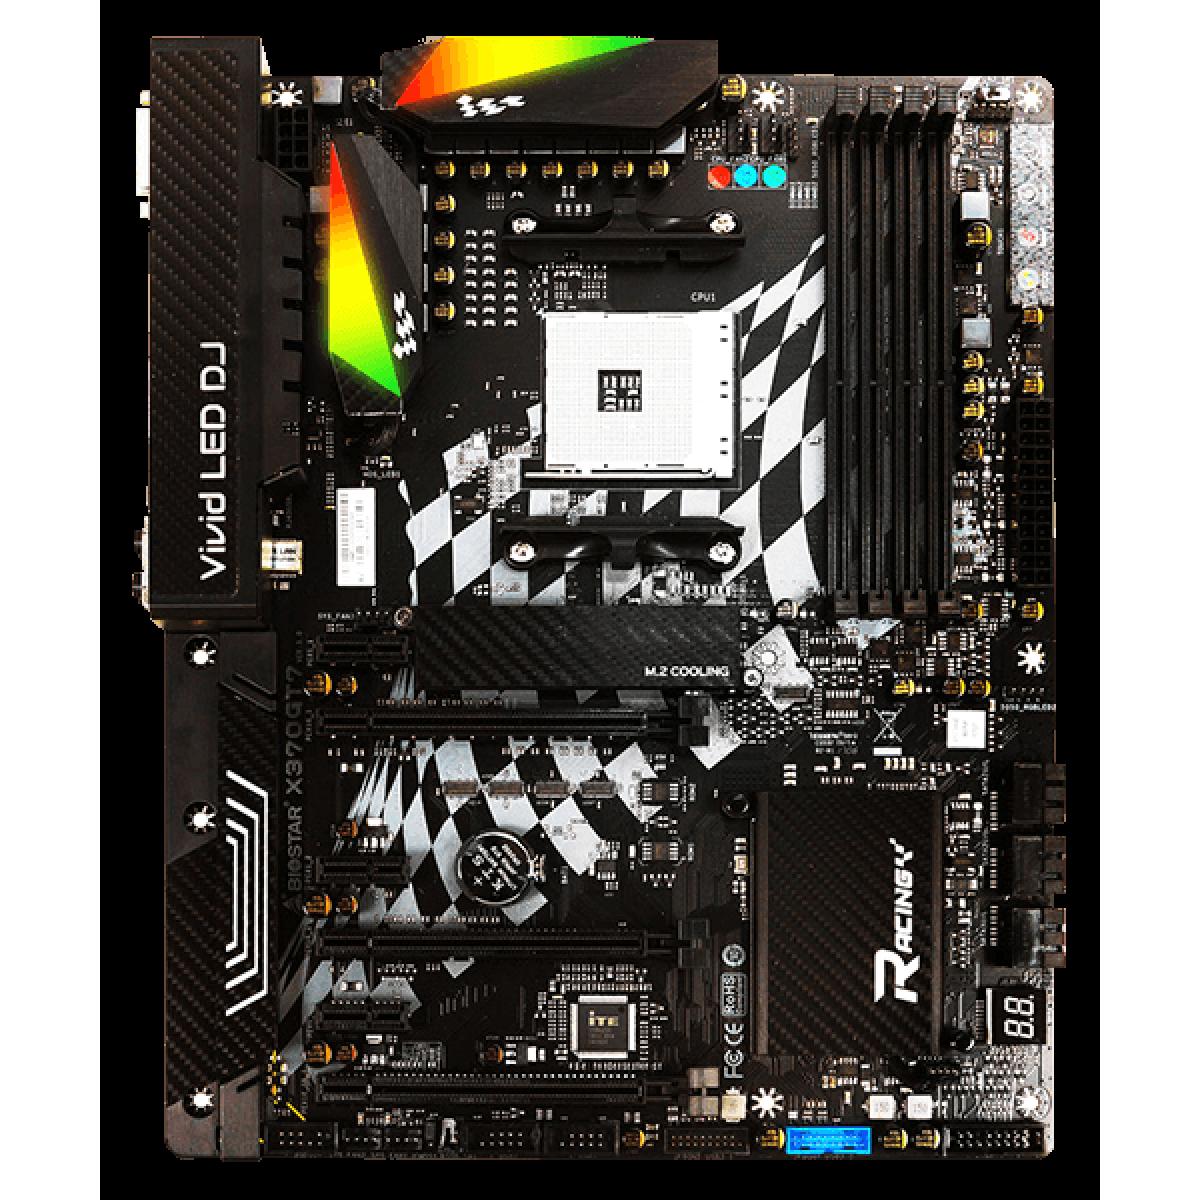 Placa Mãe Biostar Racing X370GT7, Chipset X370, AMD AM4, ATX, DDR4